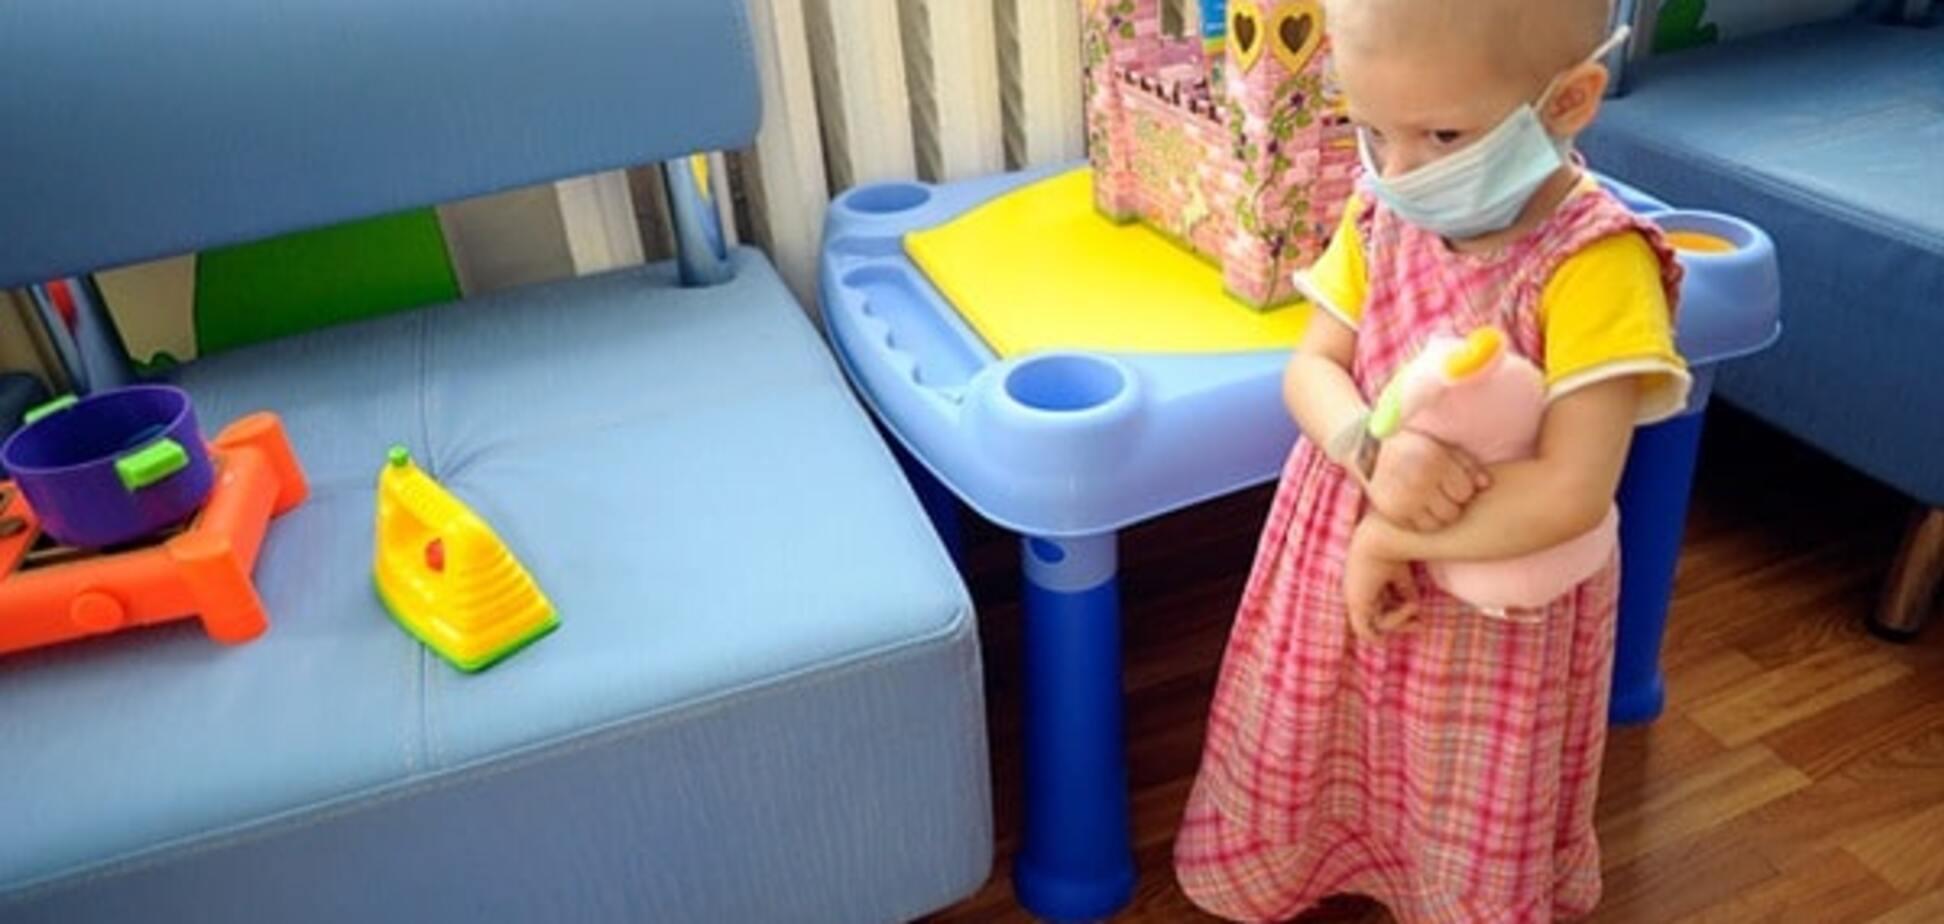 Скандал в 'Охматдит': чиновники заробляли на хворих дітях